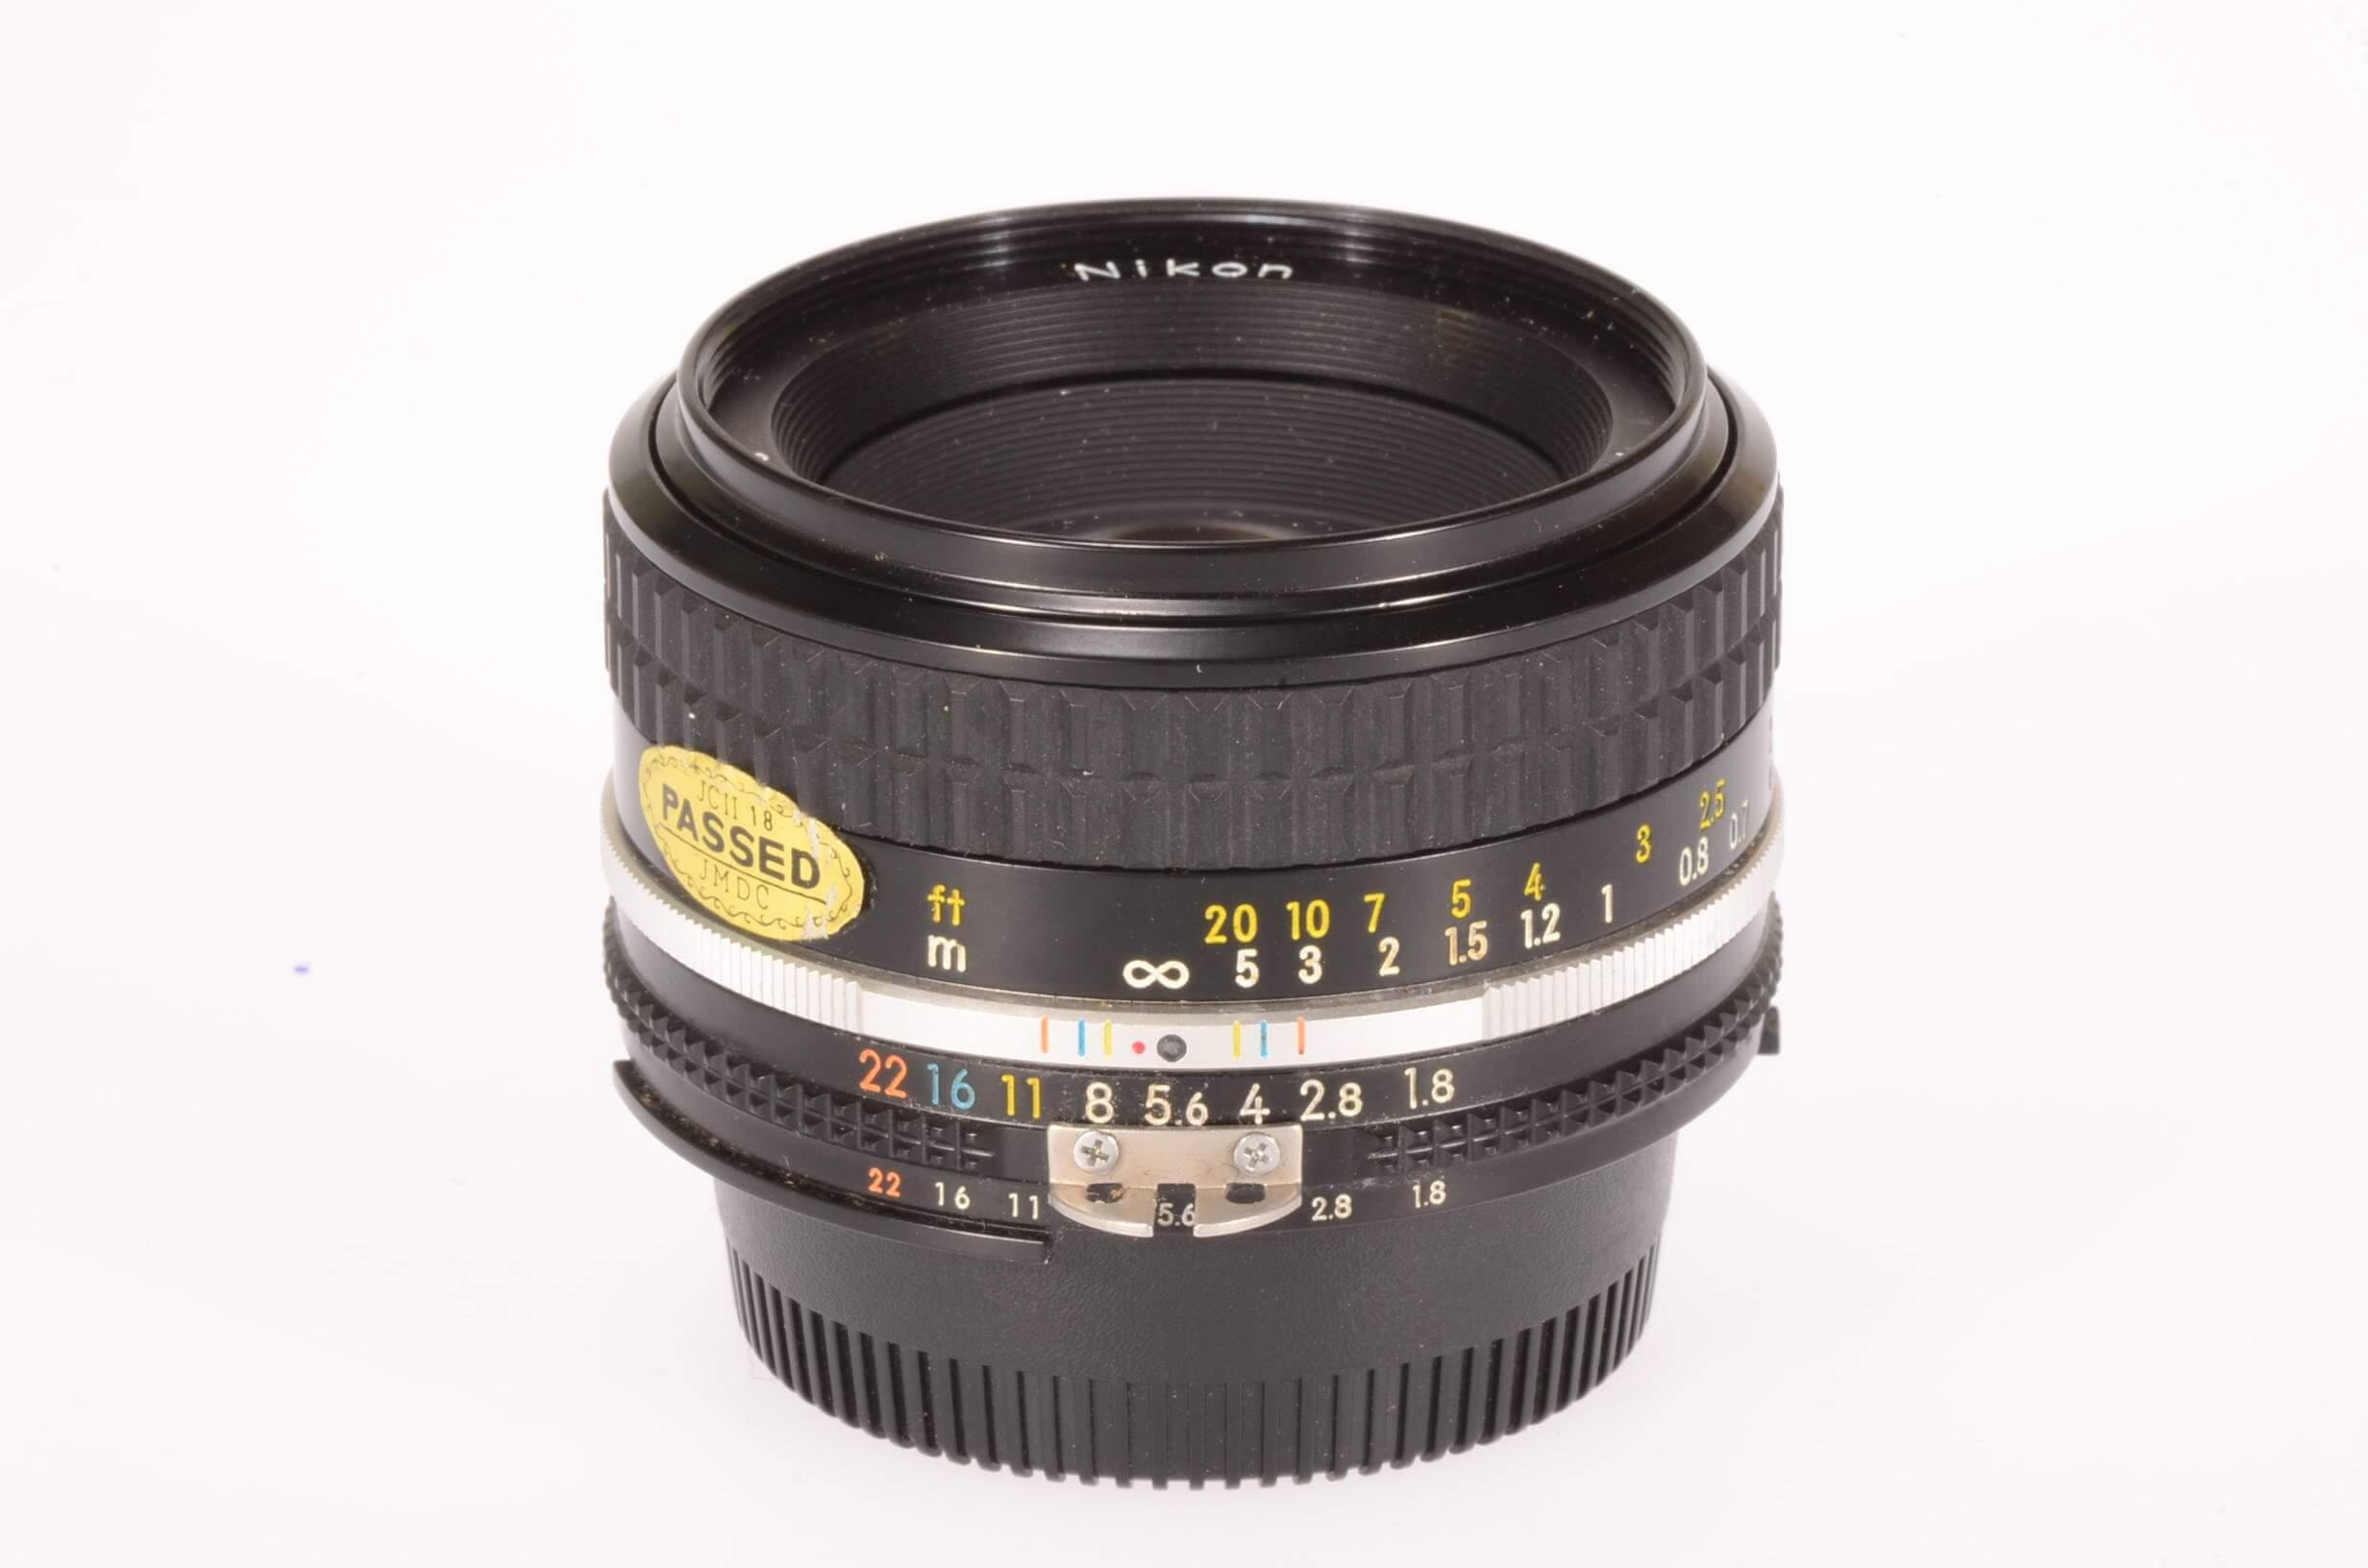 Nikon 50mm f1.8 AIS lens, serviced, almost mint